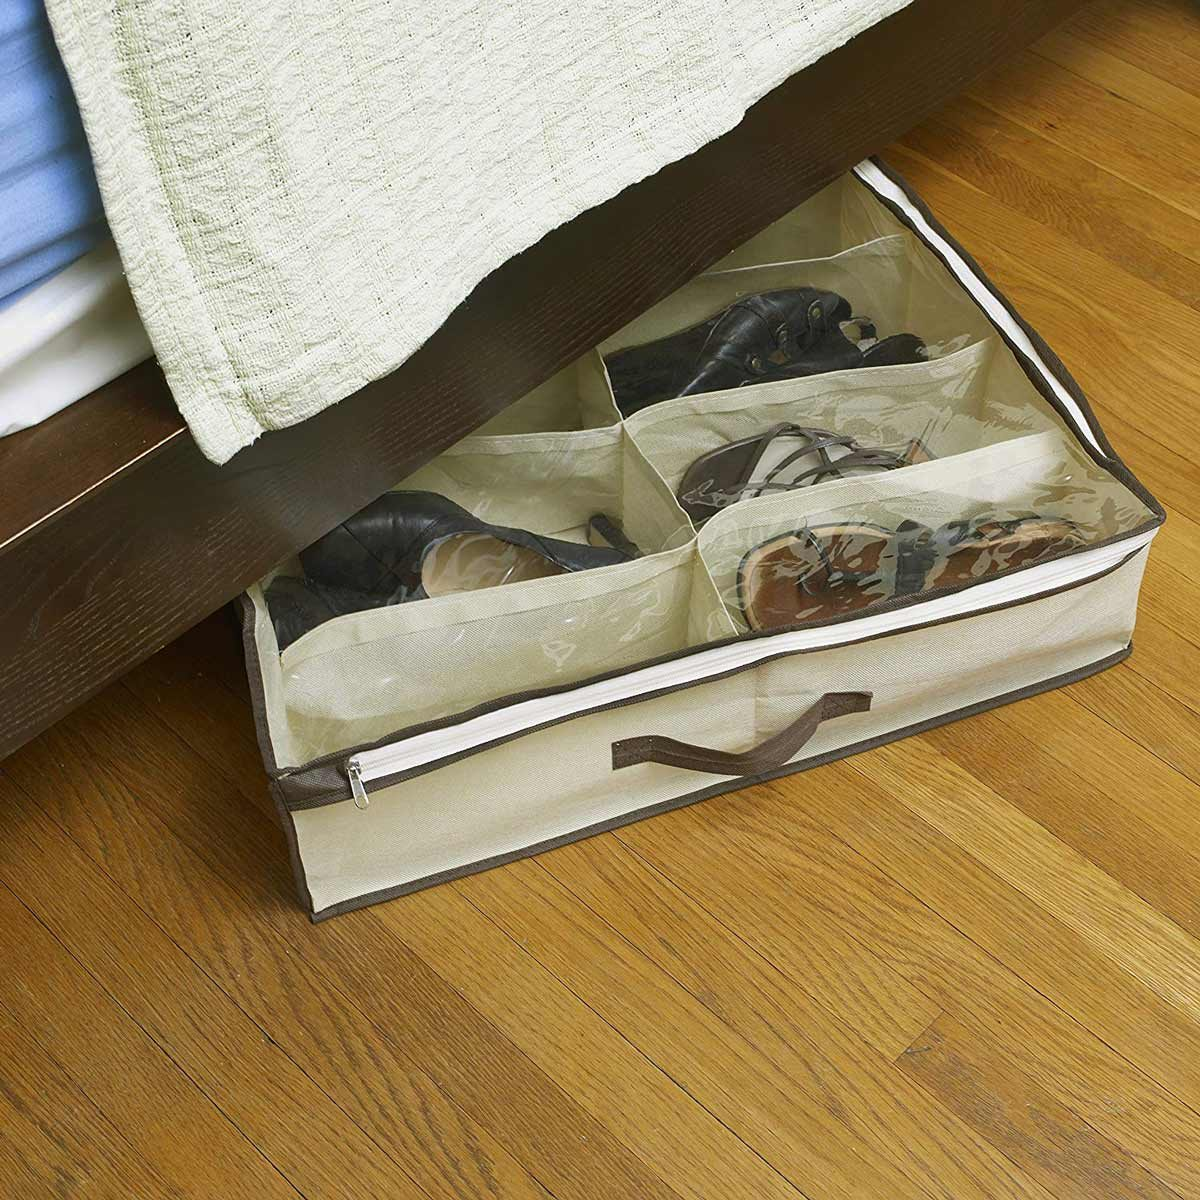 Under Bed Shoe Organizer for Kids